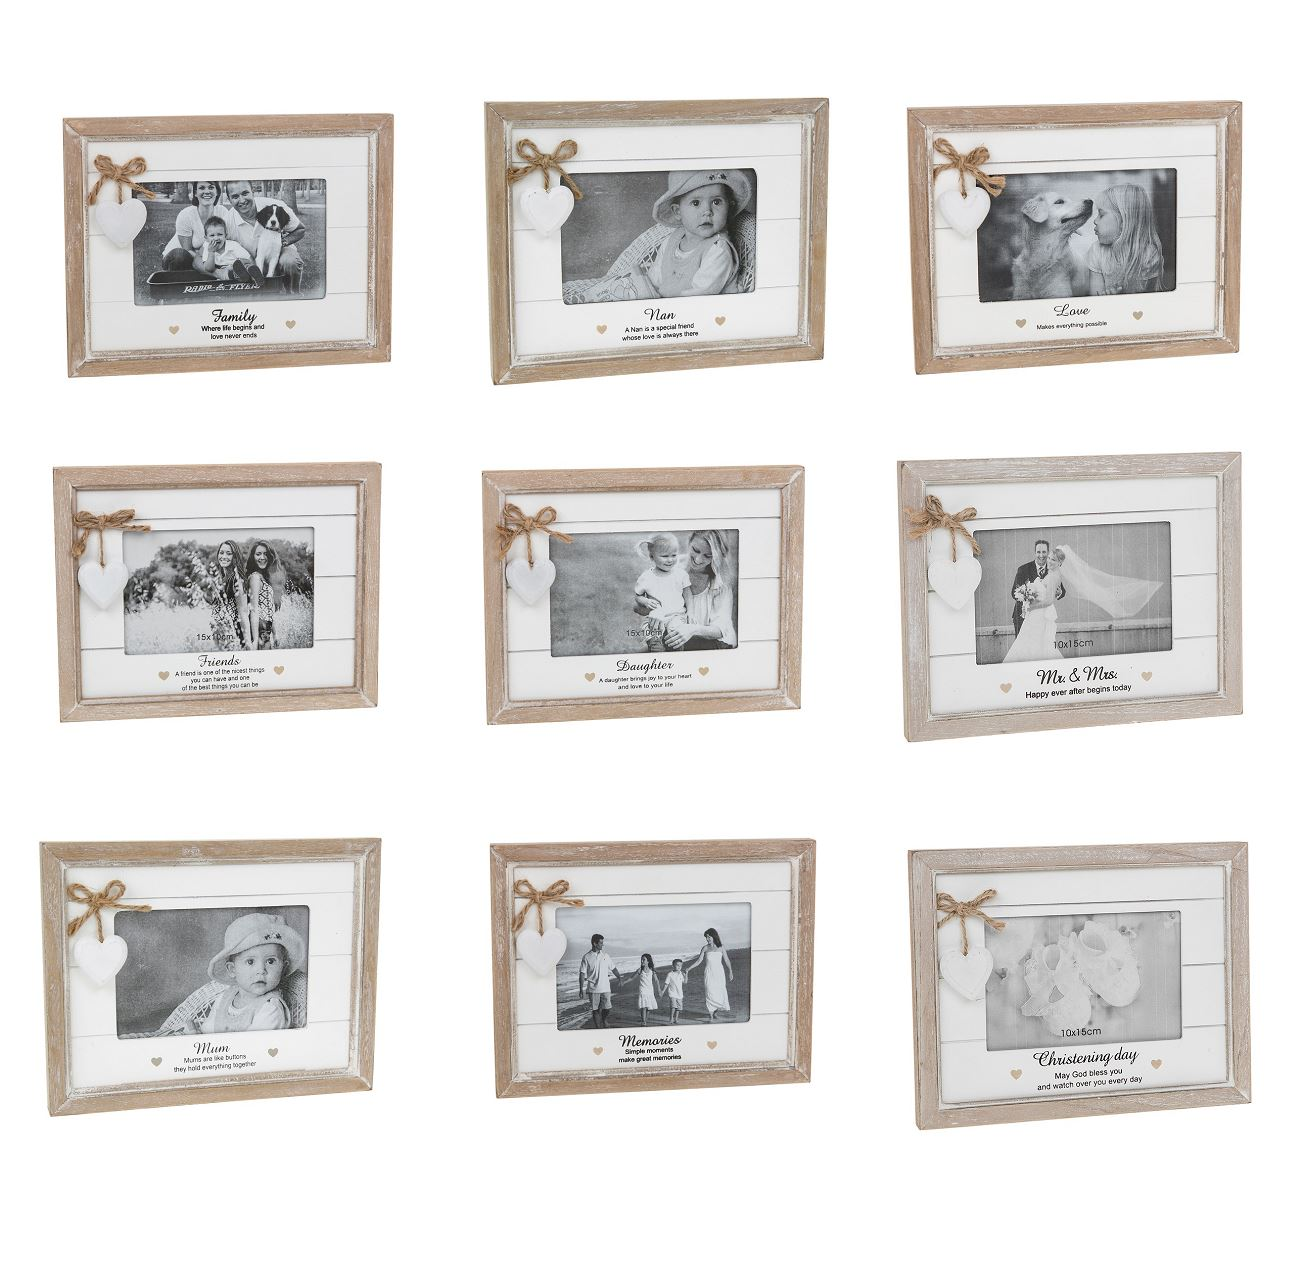 Provence 15.2cmx10.2cm Billig Holz Foto Bilder Rahmen Beunruhigt ...